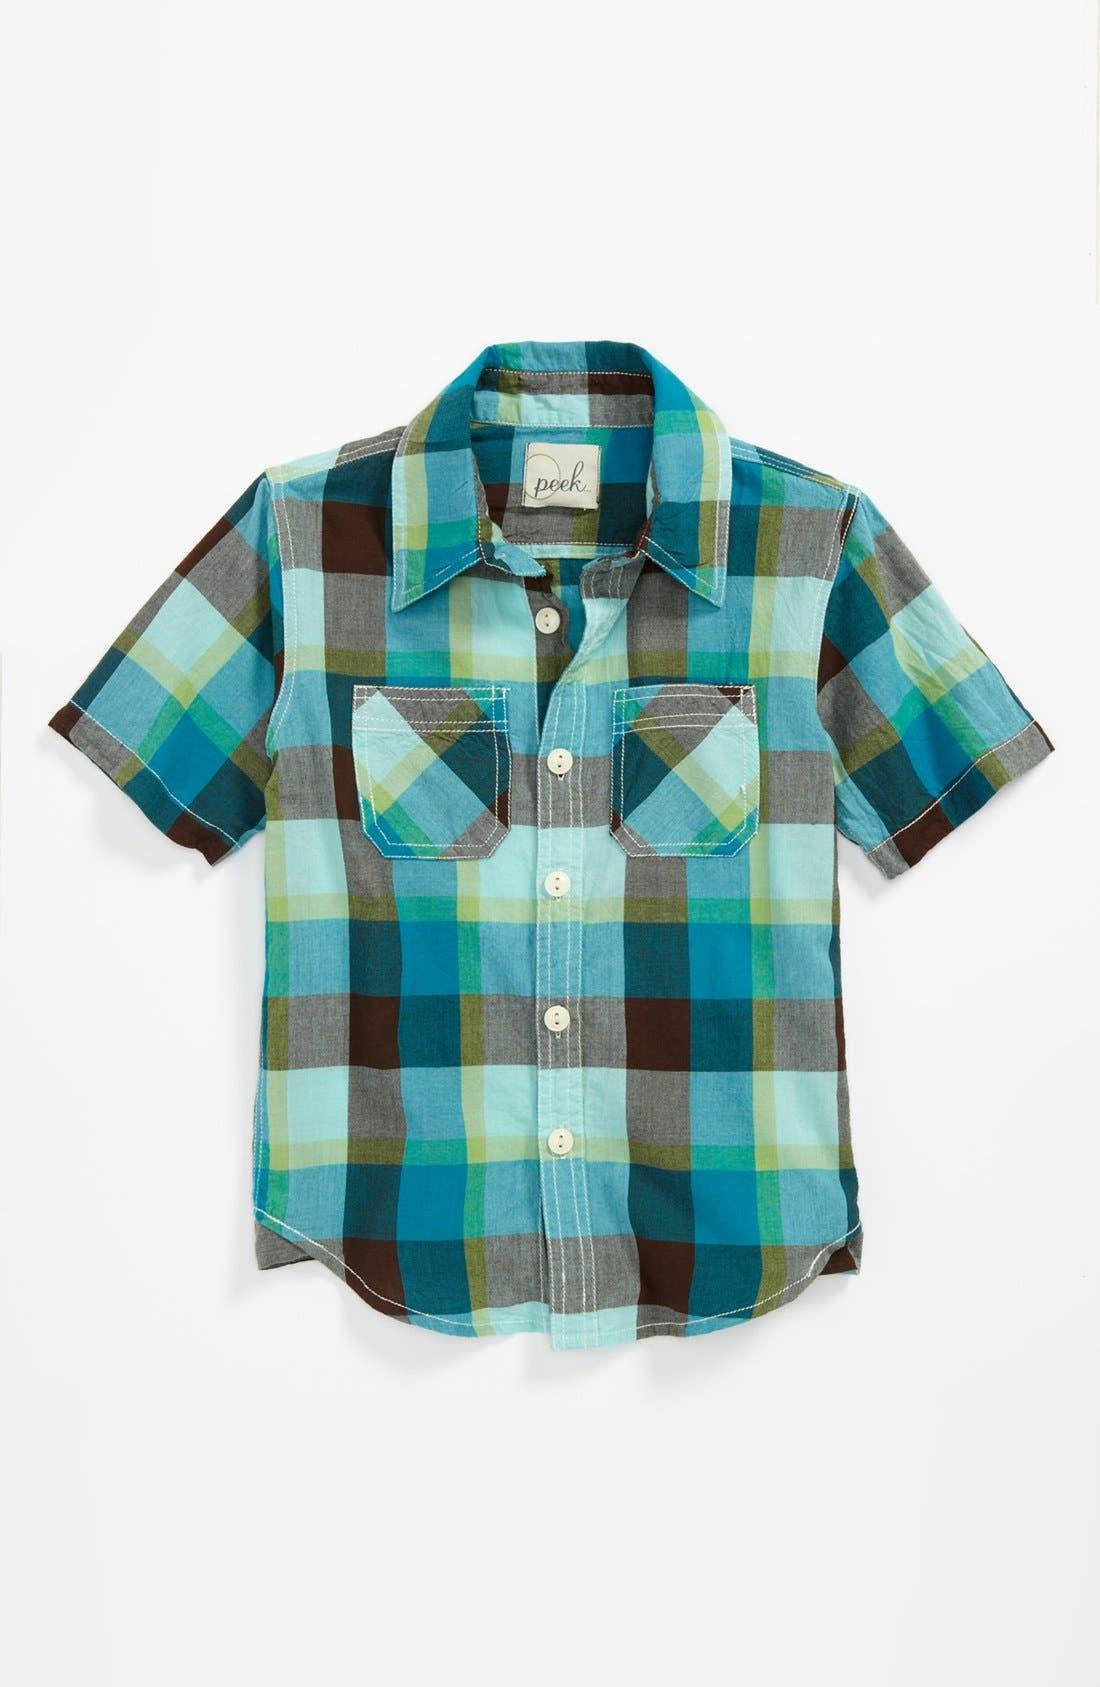 Alternate Image 1 Selected - Peek 'Clint' Utility Shirt (Big Boys)